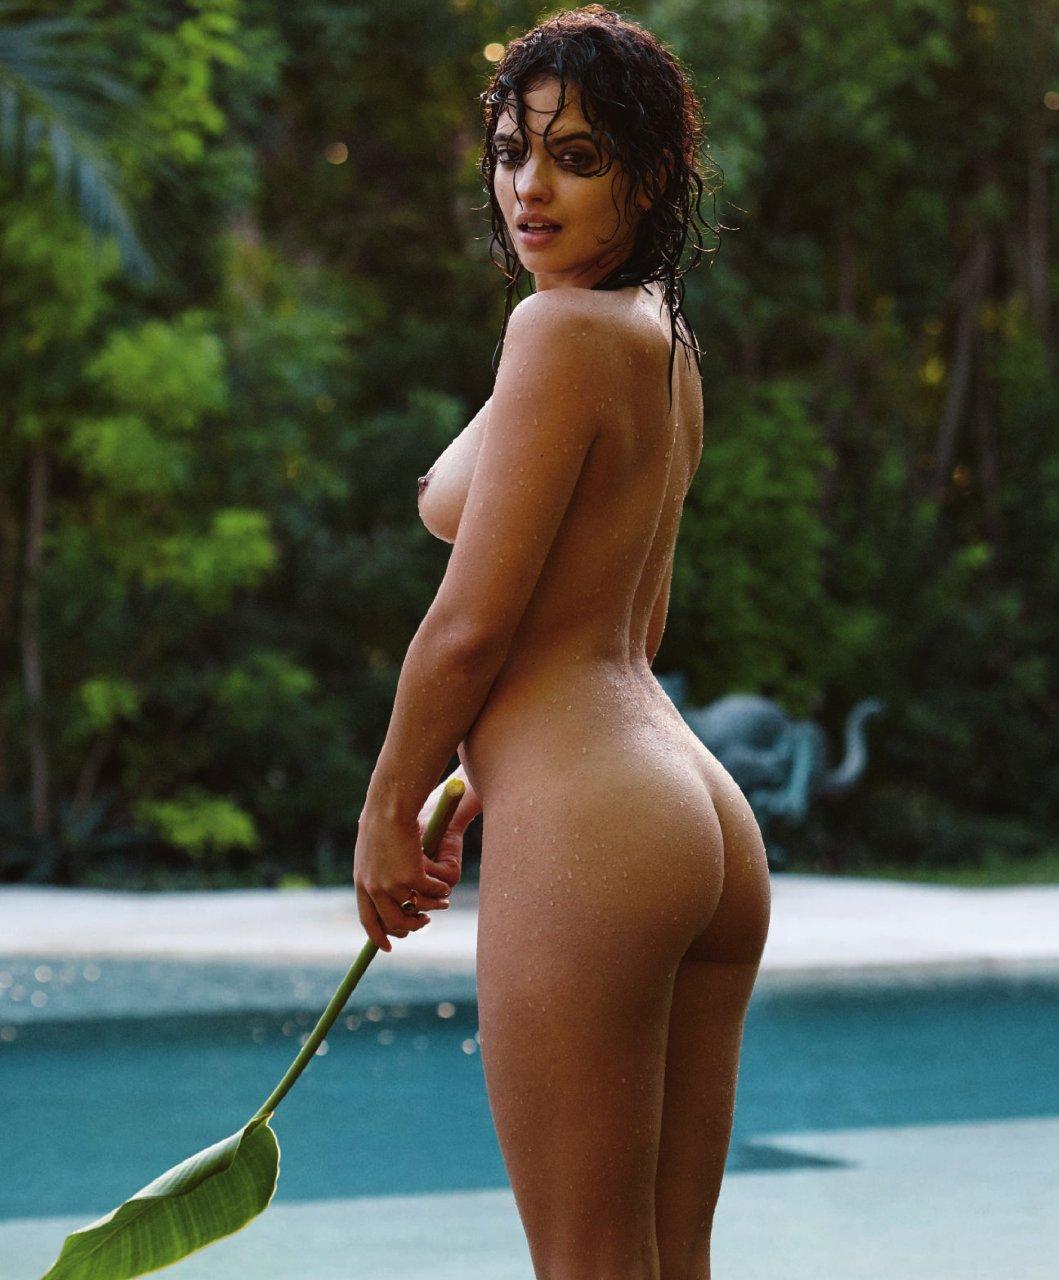 Hot ass babes in bakinis strip